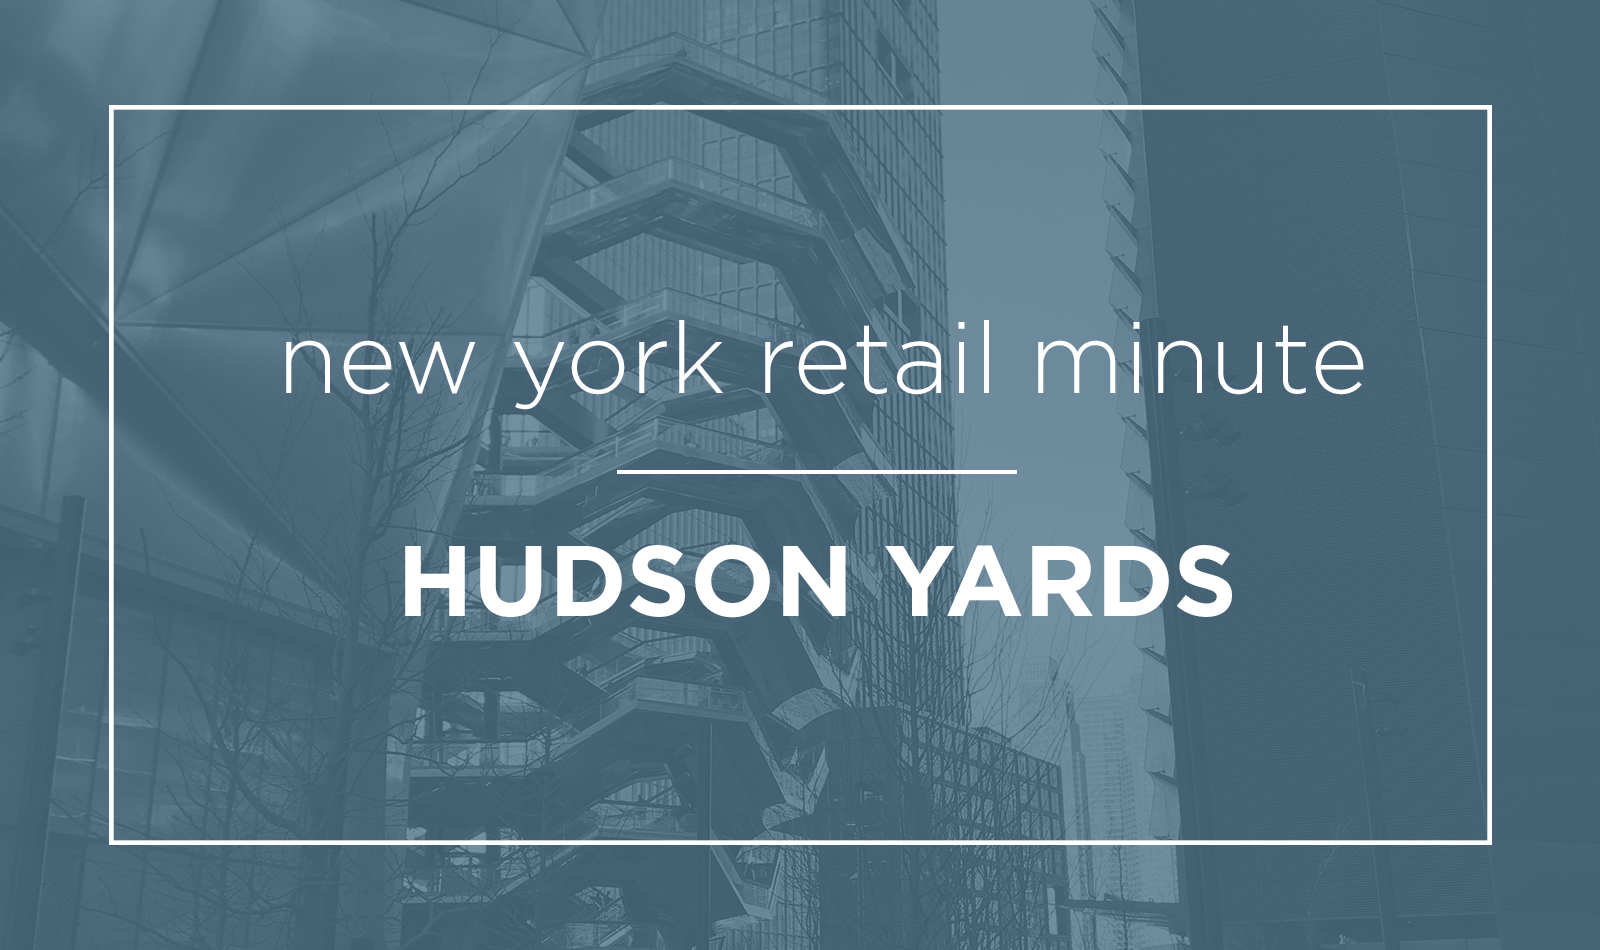 ny-retail-minute-hudson-yards-feat